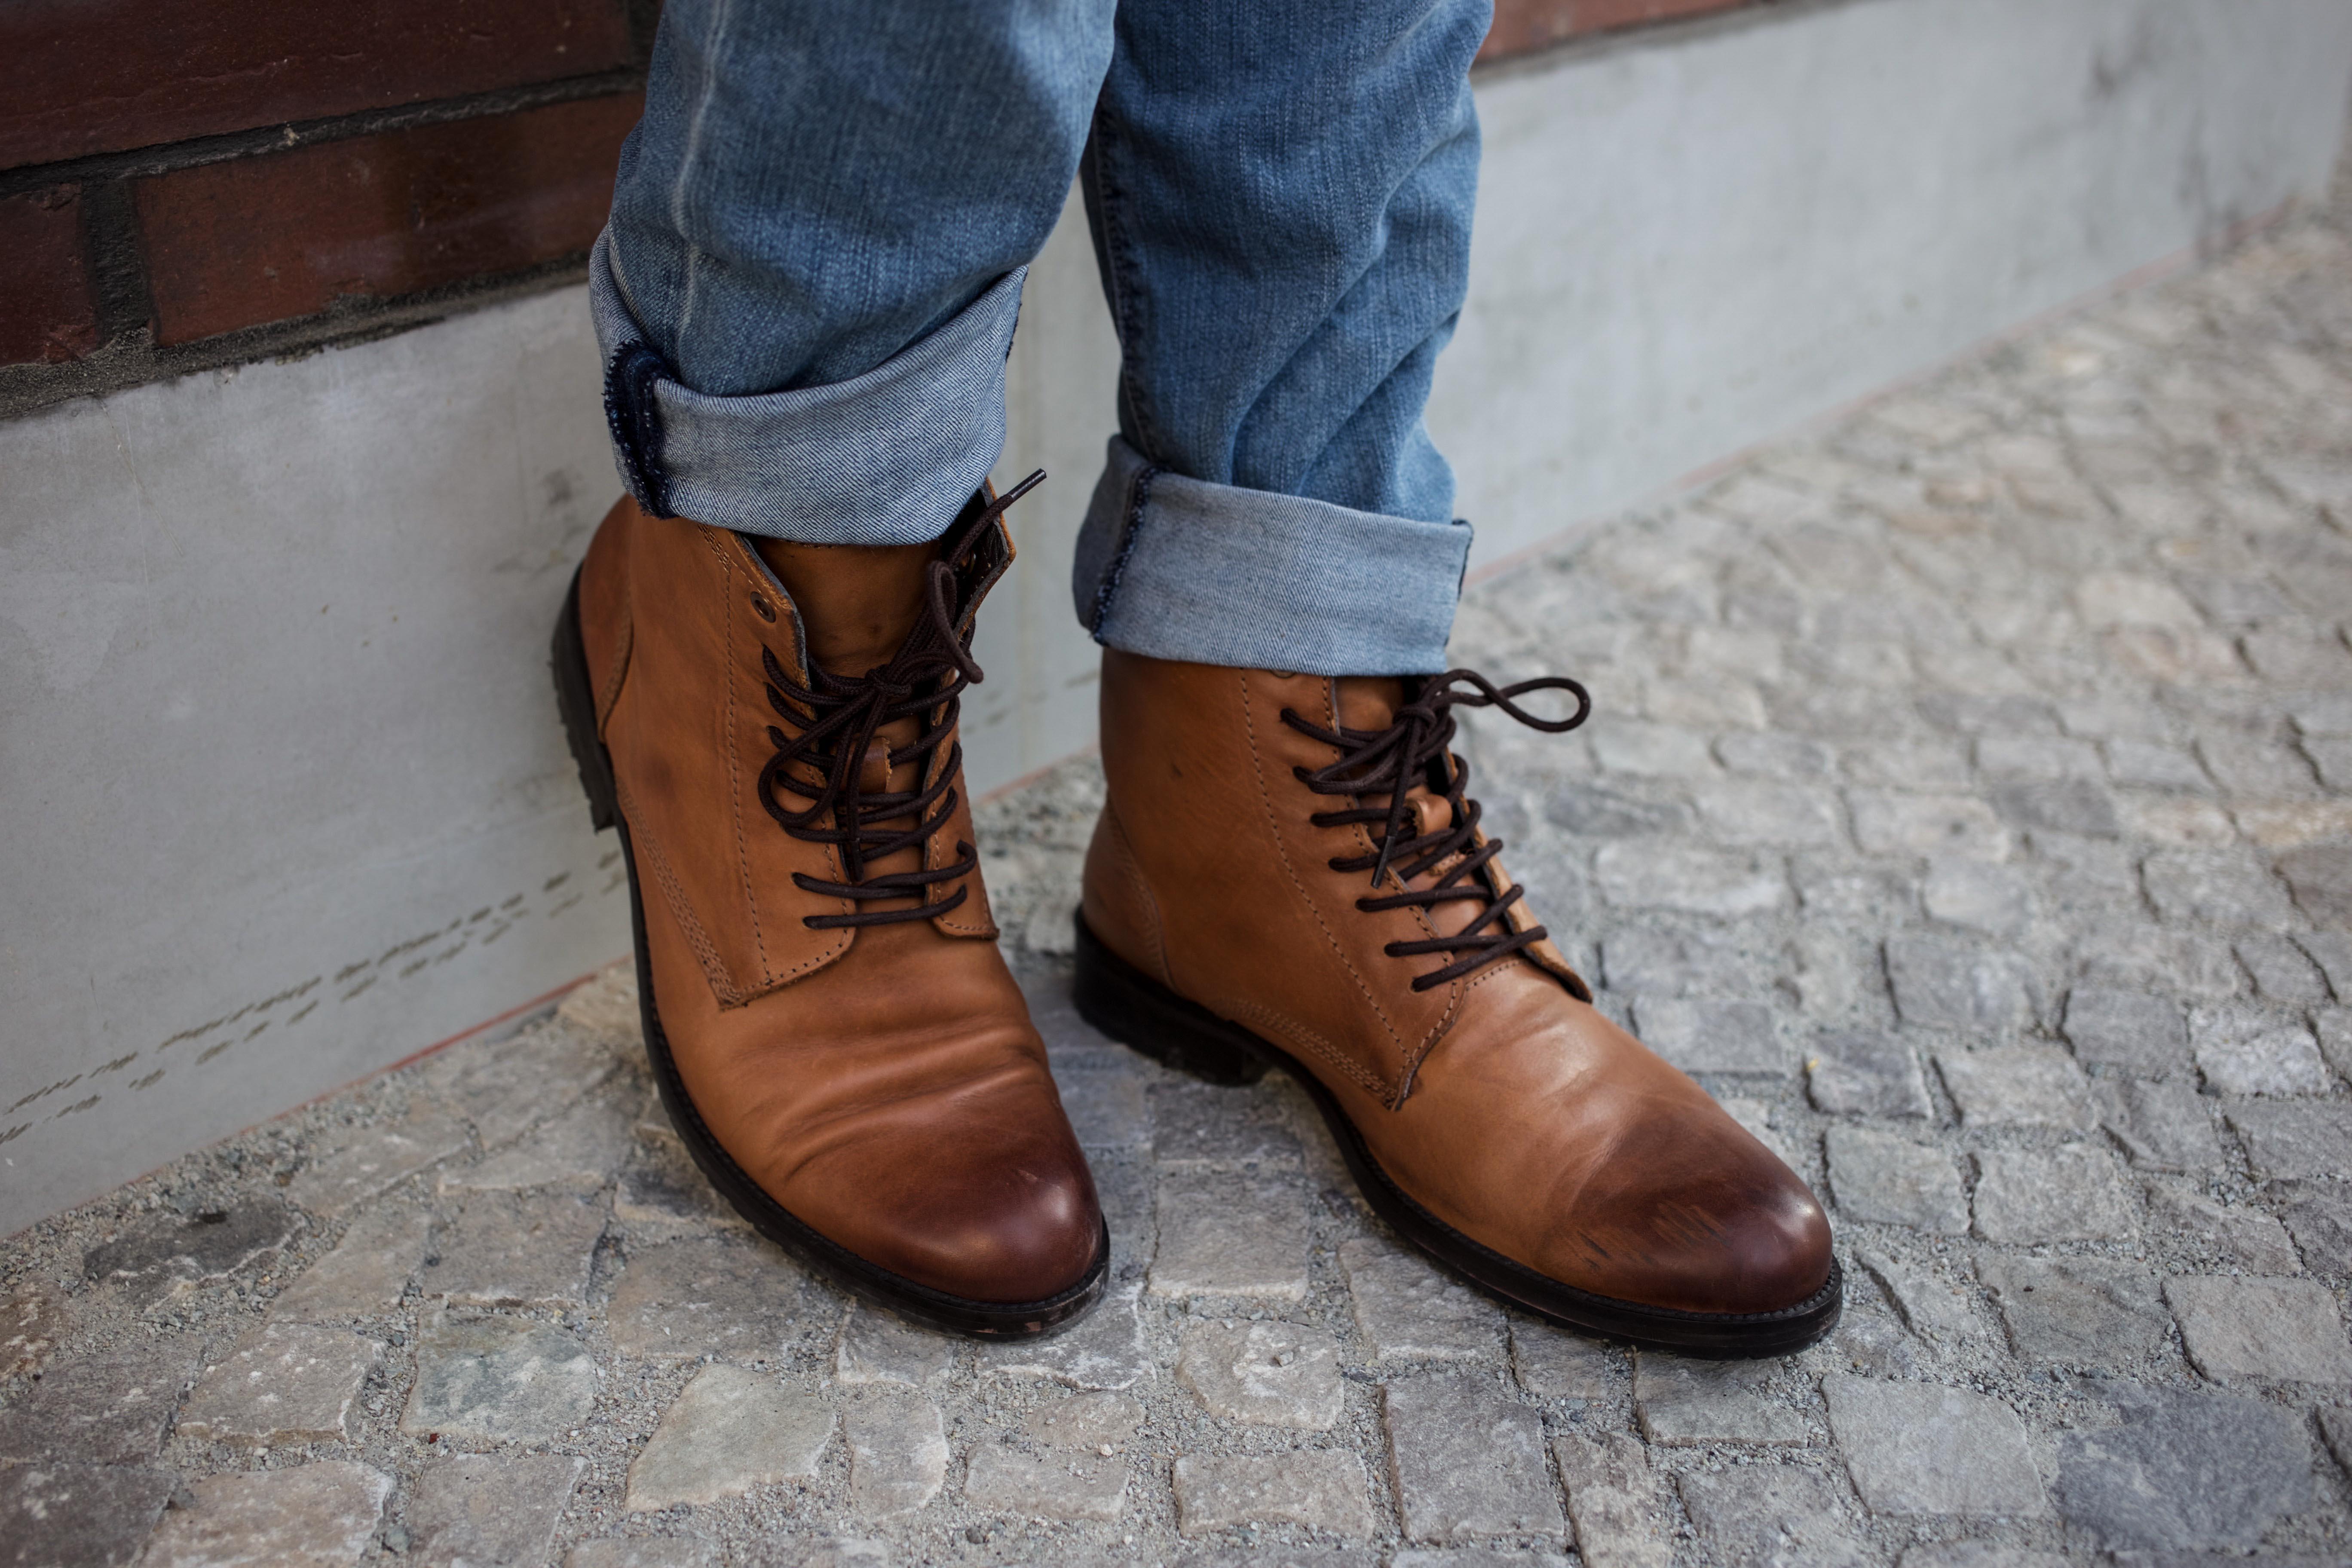 strickjacke-kombinieren-männer-beige-cardigan-blue-jeans-fashionblog-berlin-modeblog_9022